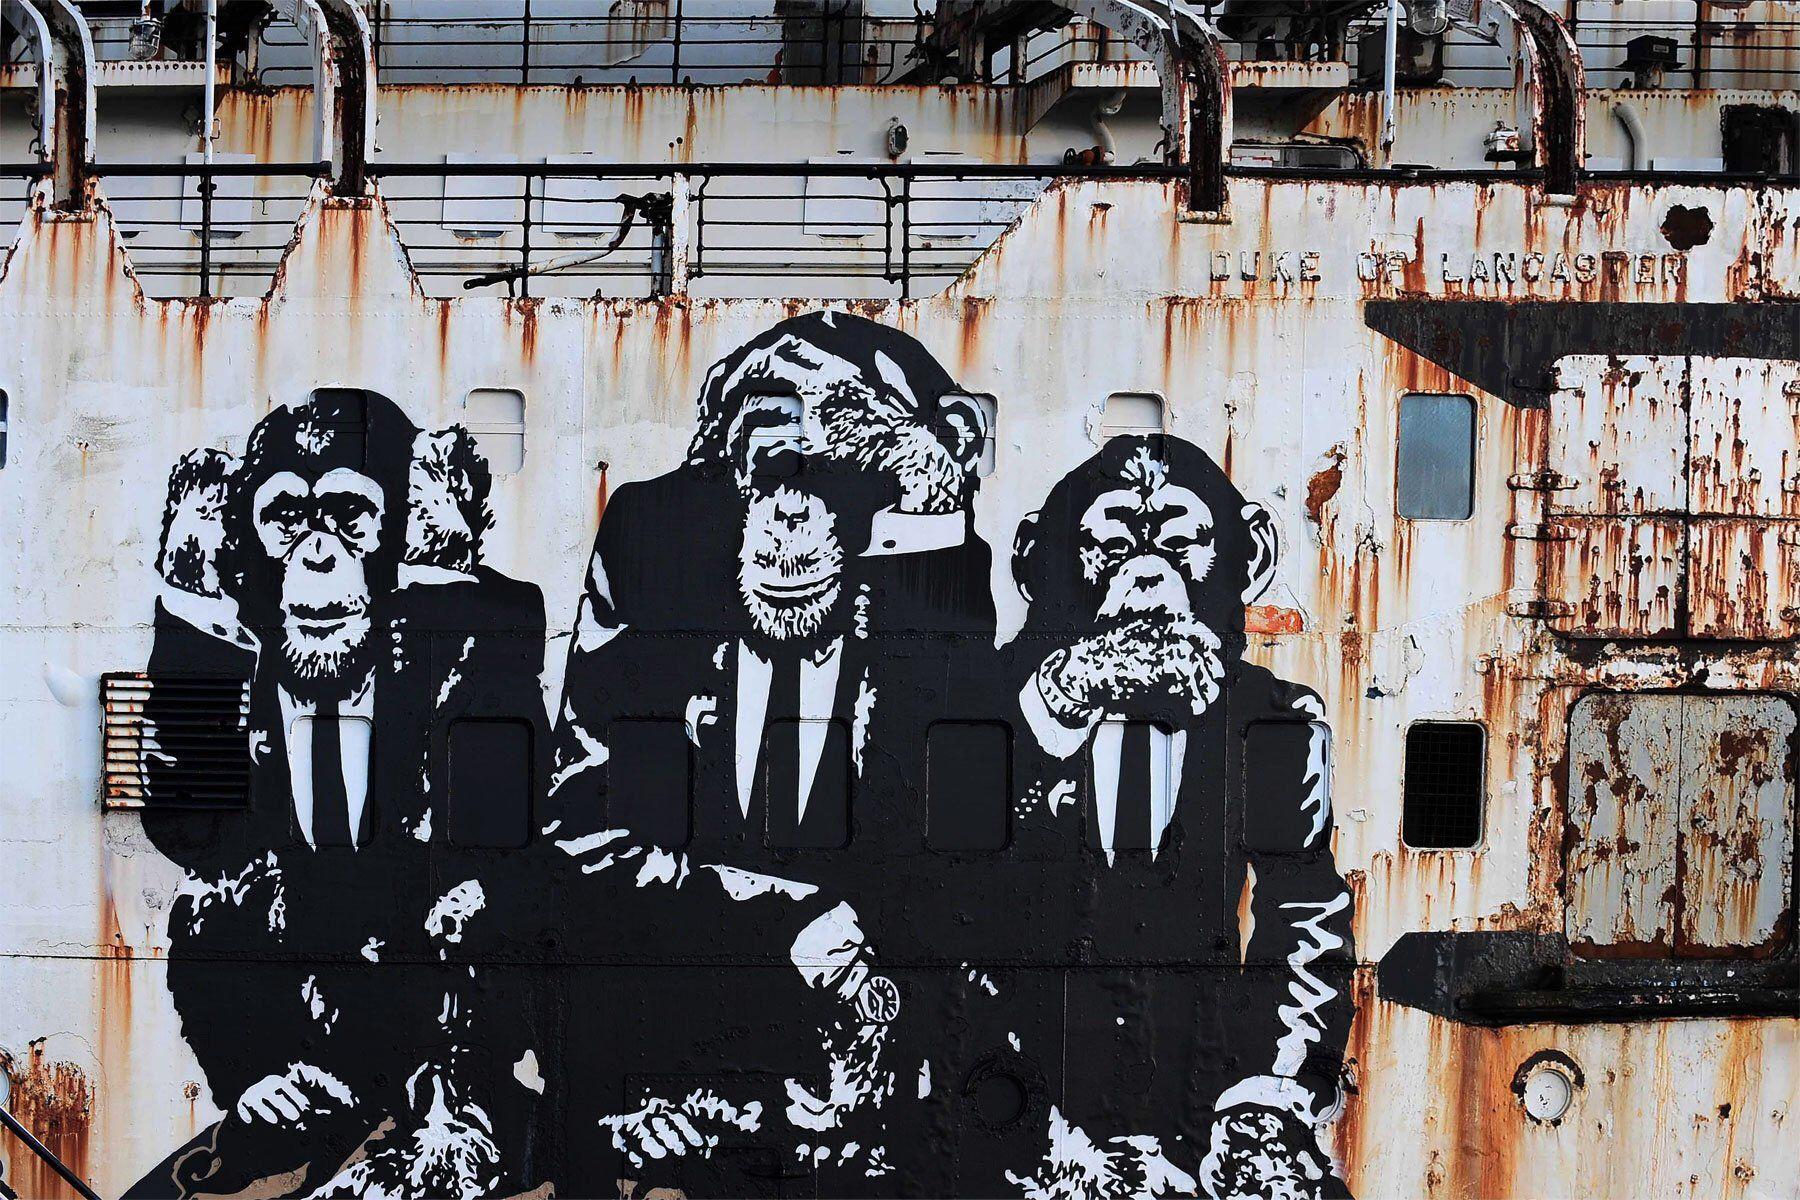 Three Wise Monkeys Graffiti Street Art Metal Poster Extra Etsy In 2021 Wise Monkeys Three Wise Monkeys Monkey Art